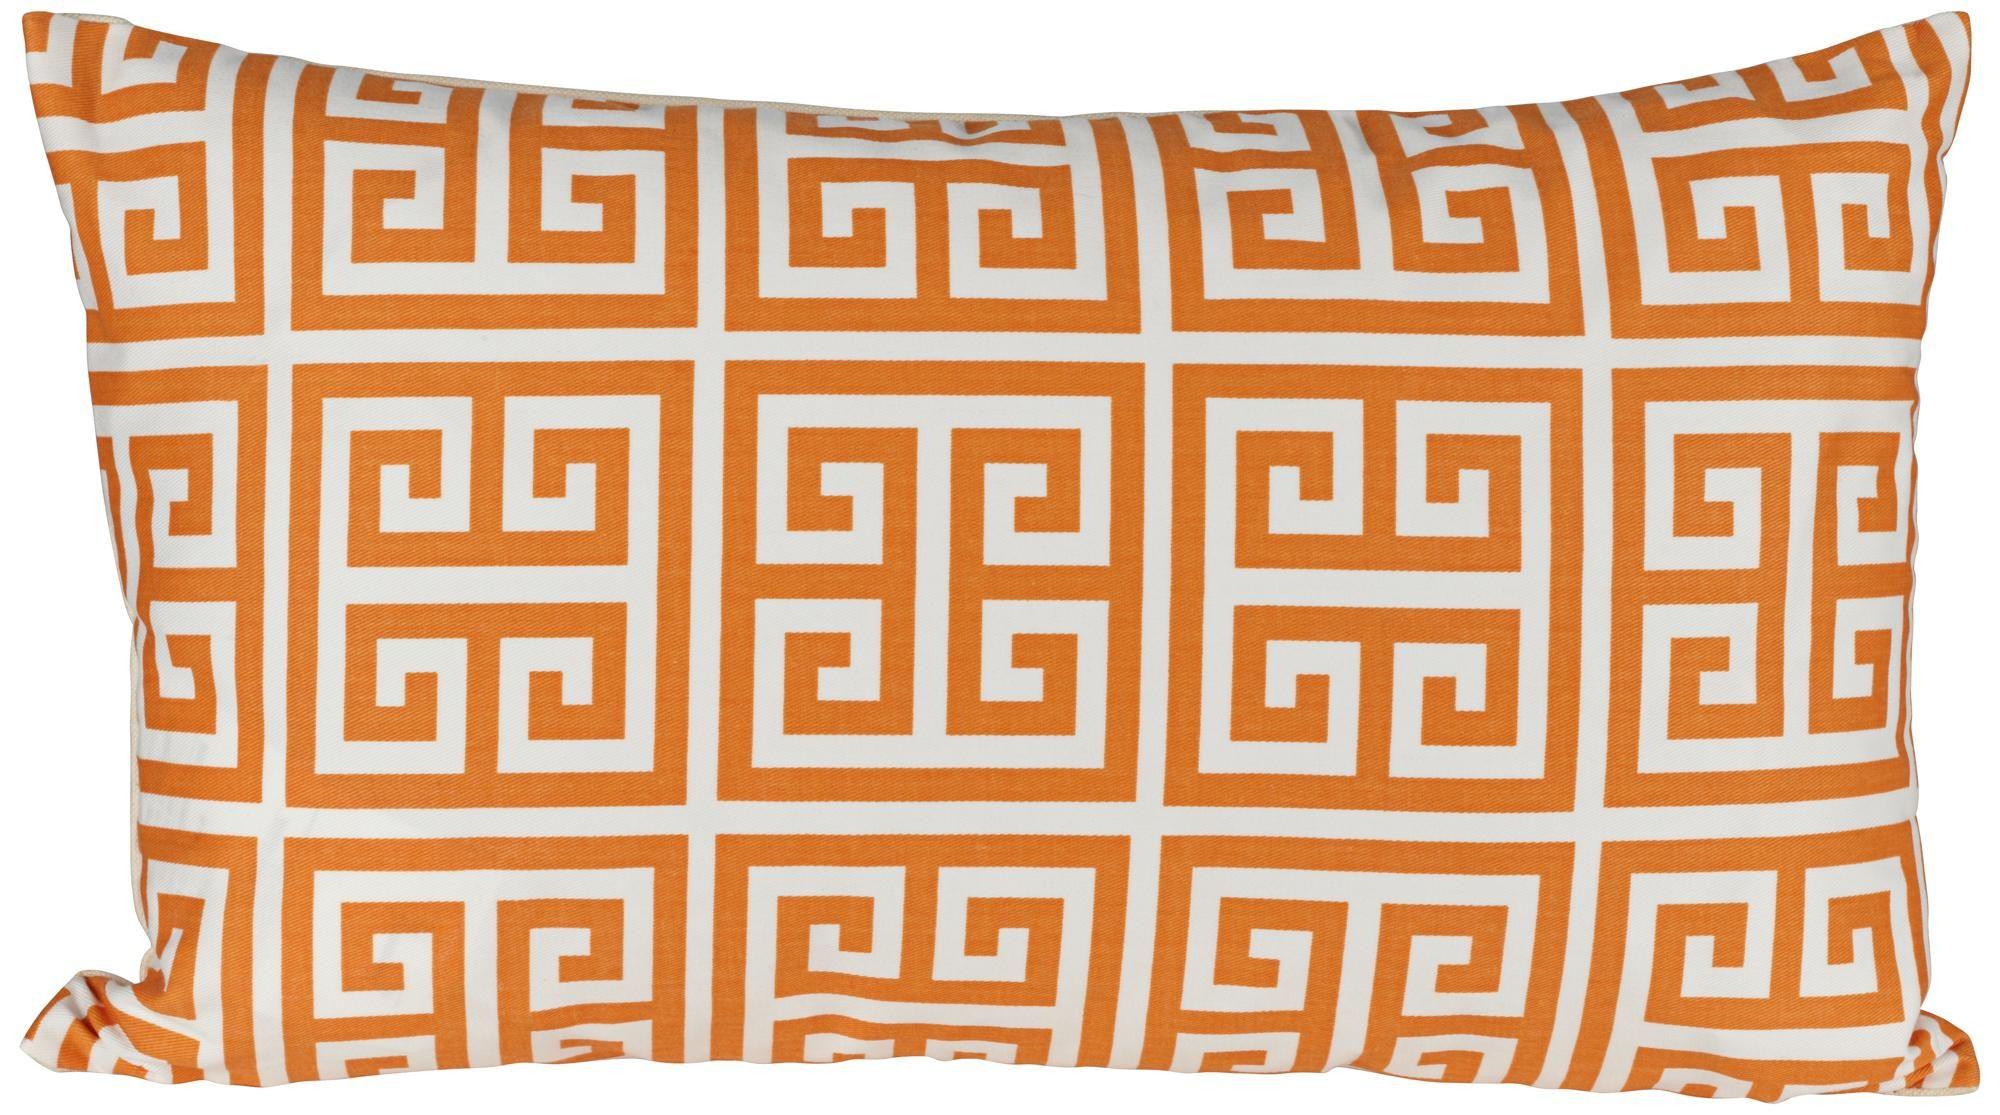 and product arhaus furniture x orange pillows decor largestandard extend natural preorder pillow productstandardzoom lumbar swan